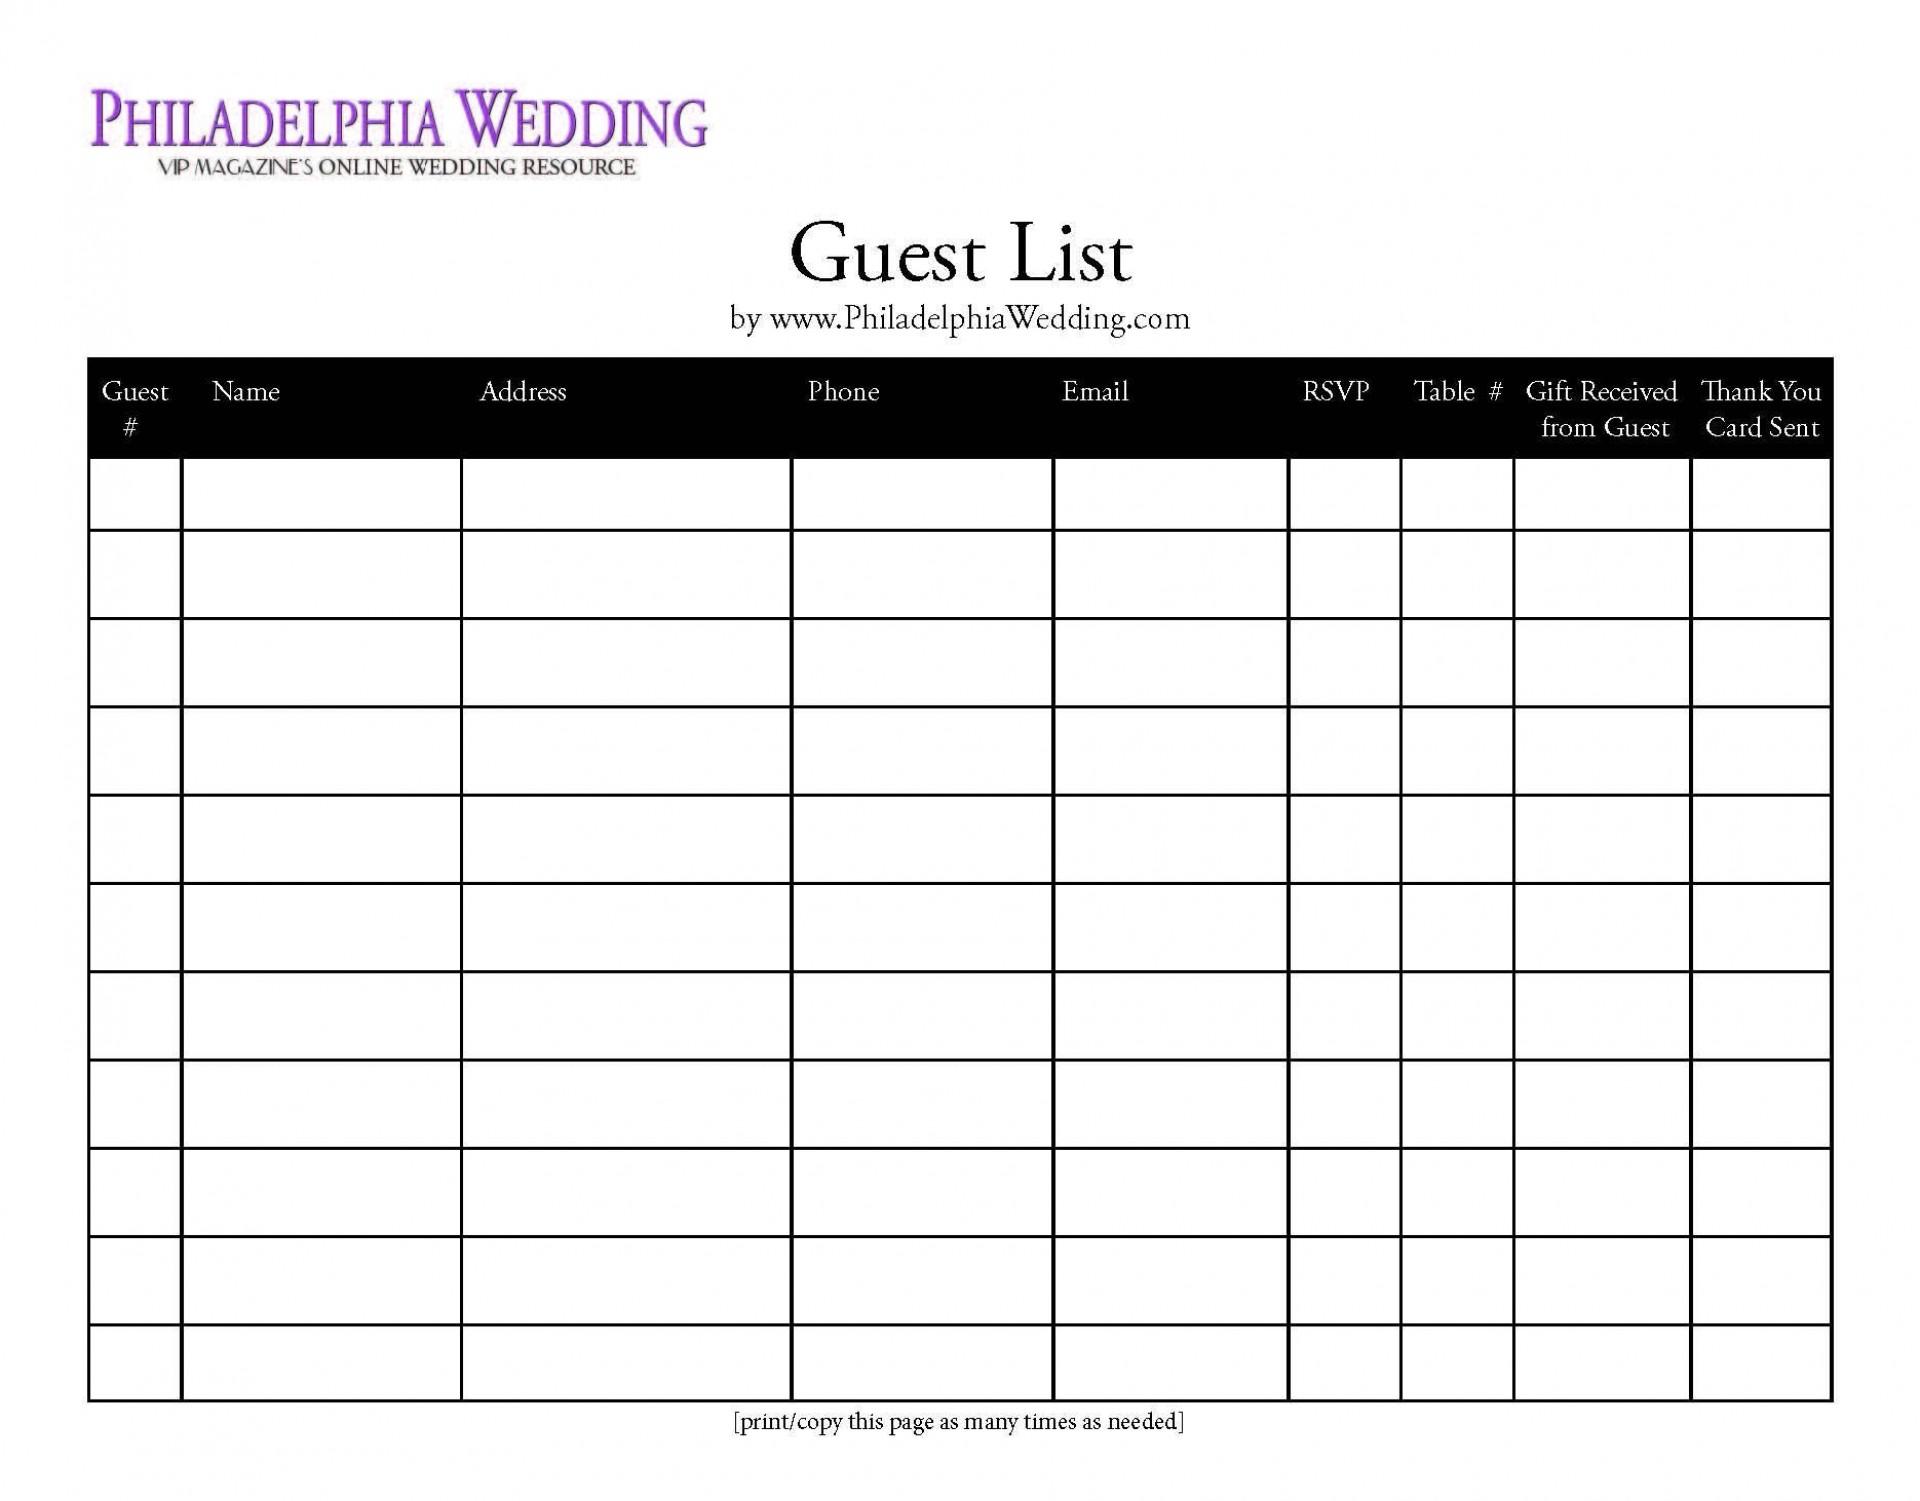 002 Frightening Rsvp Guest List Template Excel High Resolution 1920